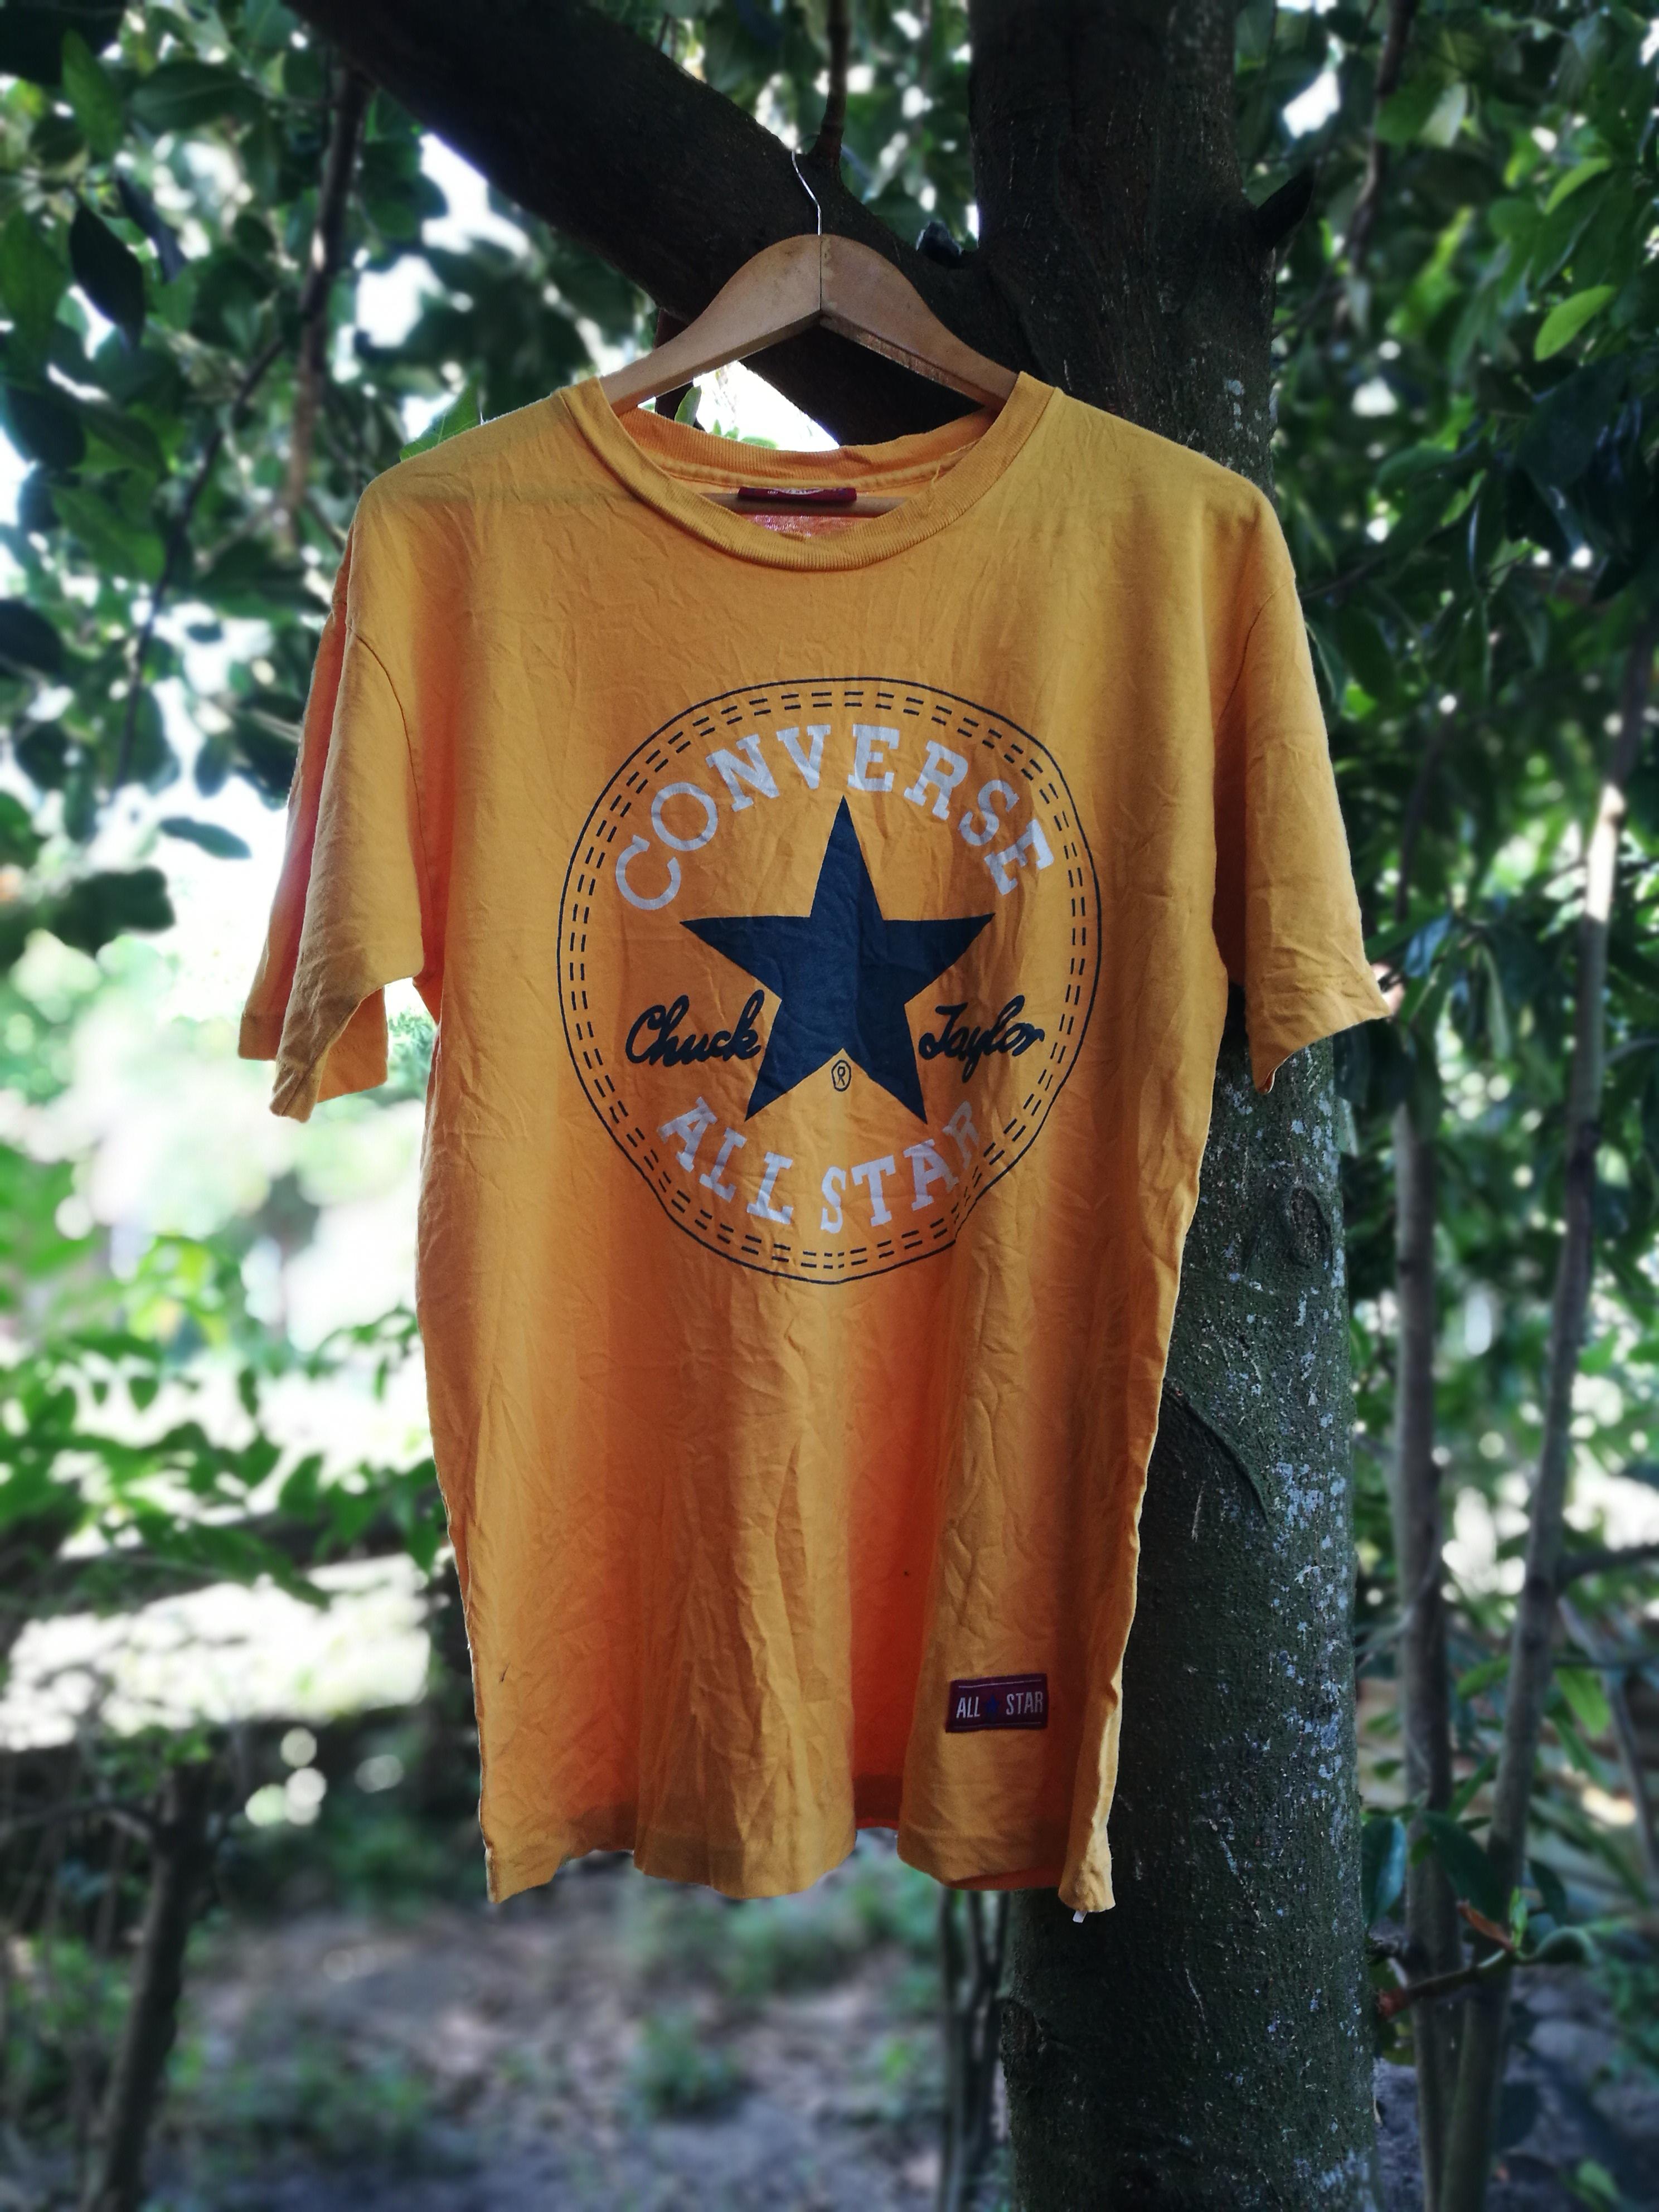 Converse Vintage Converse Chuck Taylor All Star big logo Dennis Rodman Made  in USA Size m - Short Sleeve T-Shirts for Sale - Grailed 514edbc8d